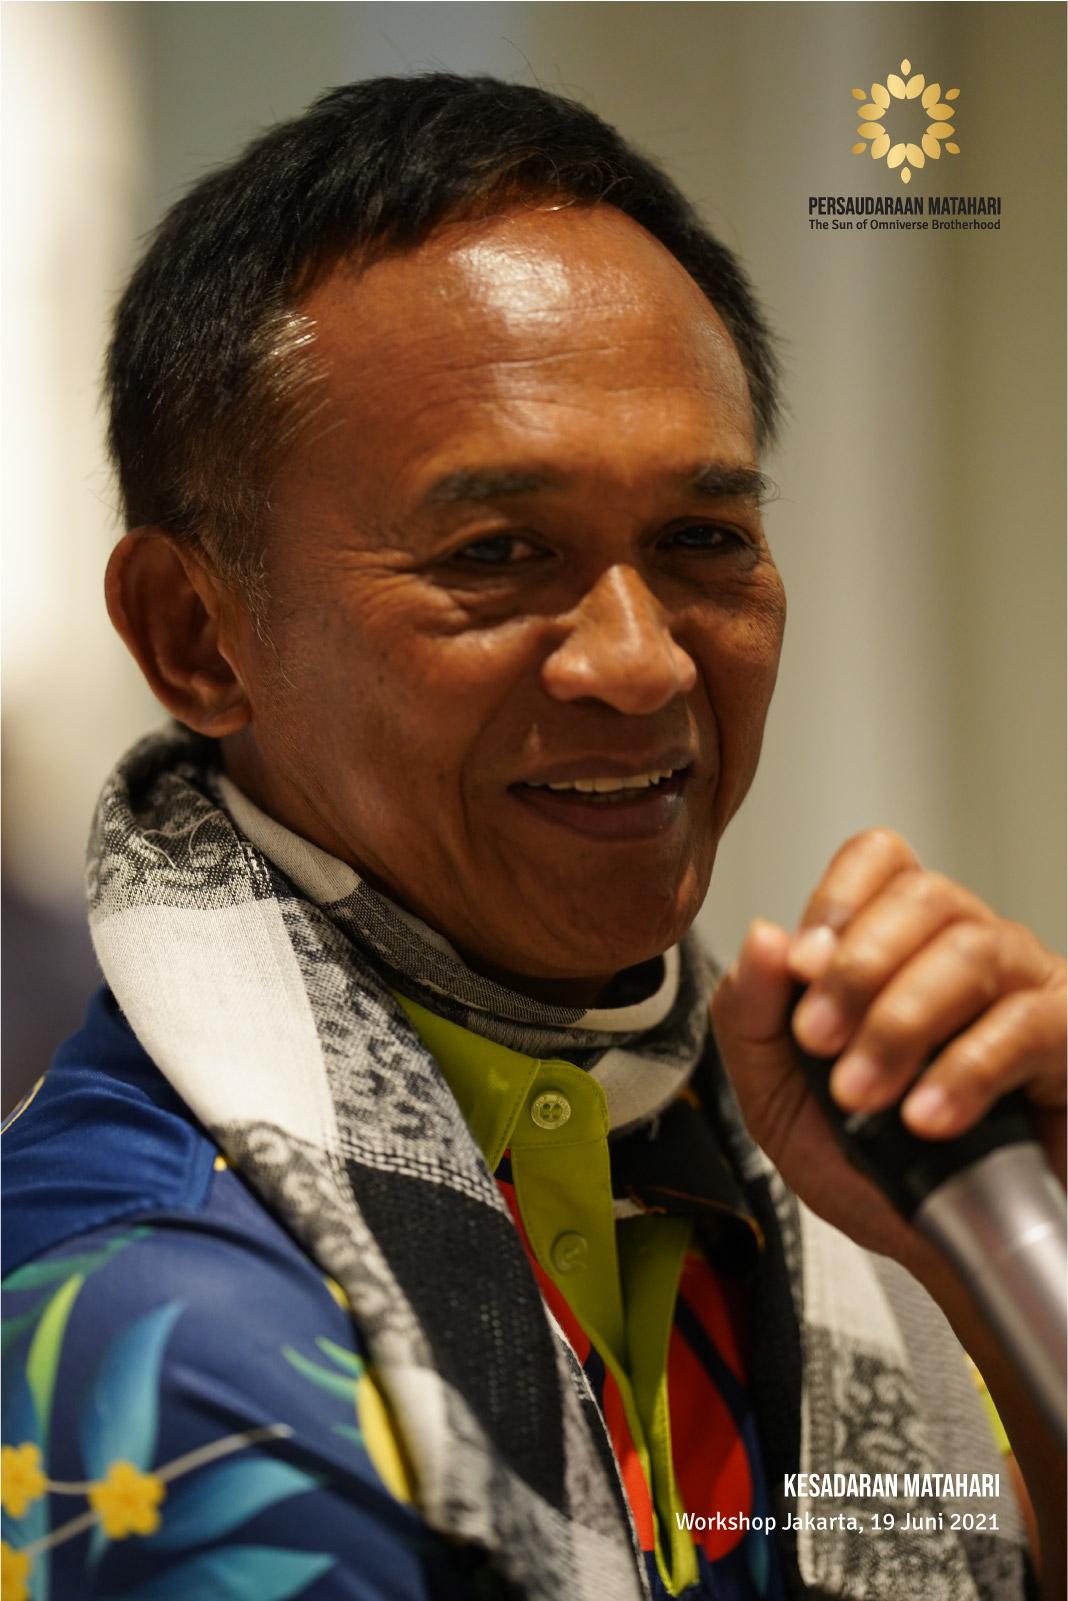 Workshop Jakarta 19 Juni 2021: Kesadaran Matahari